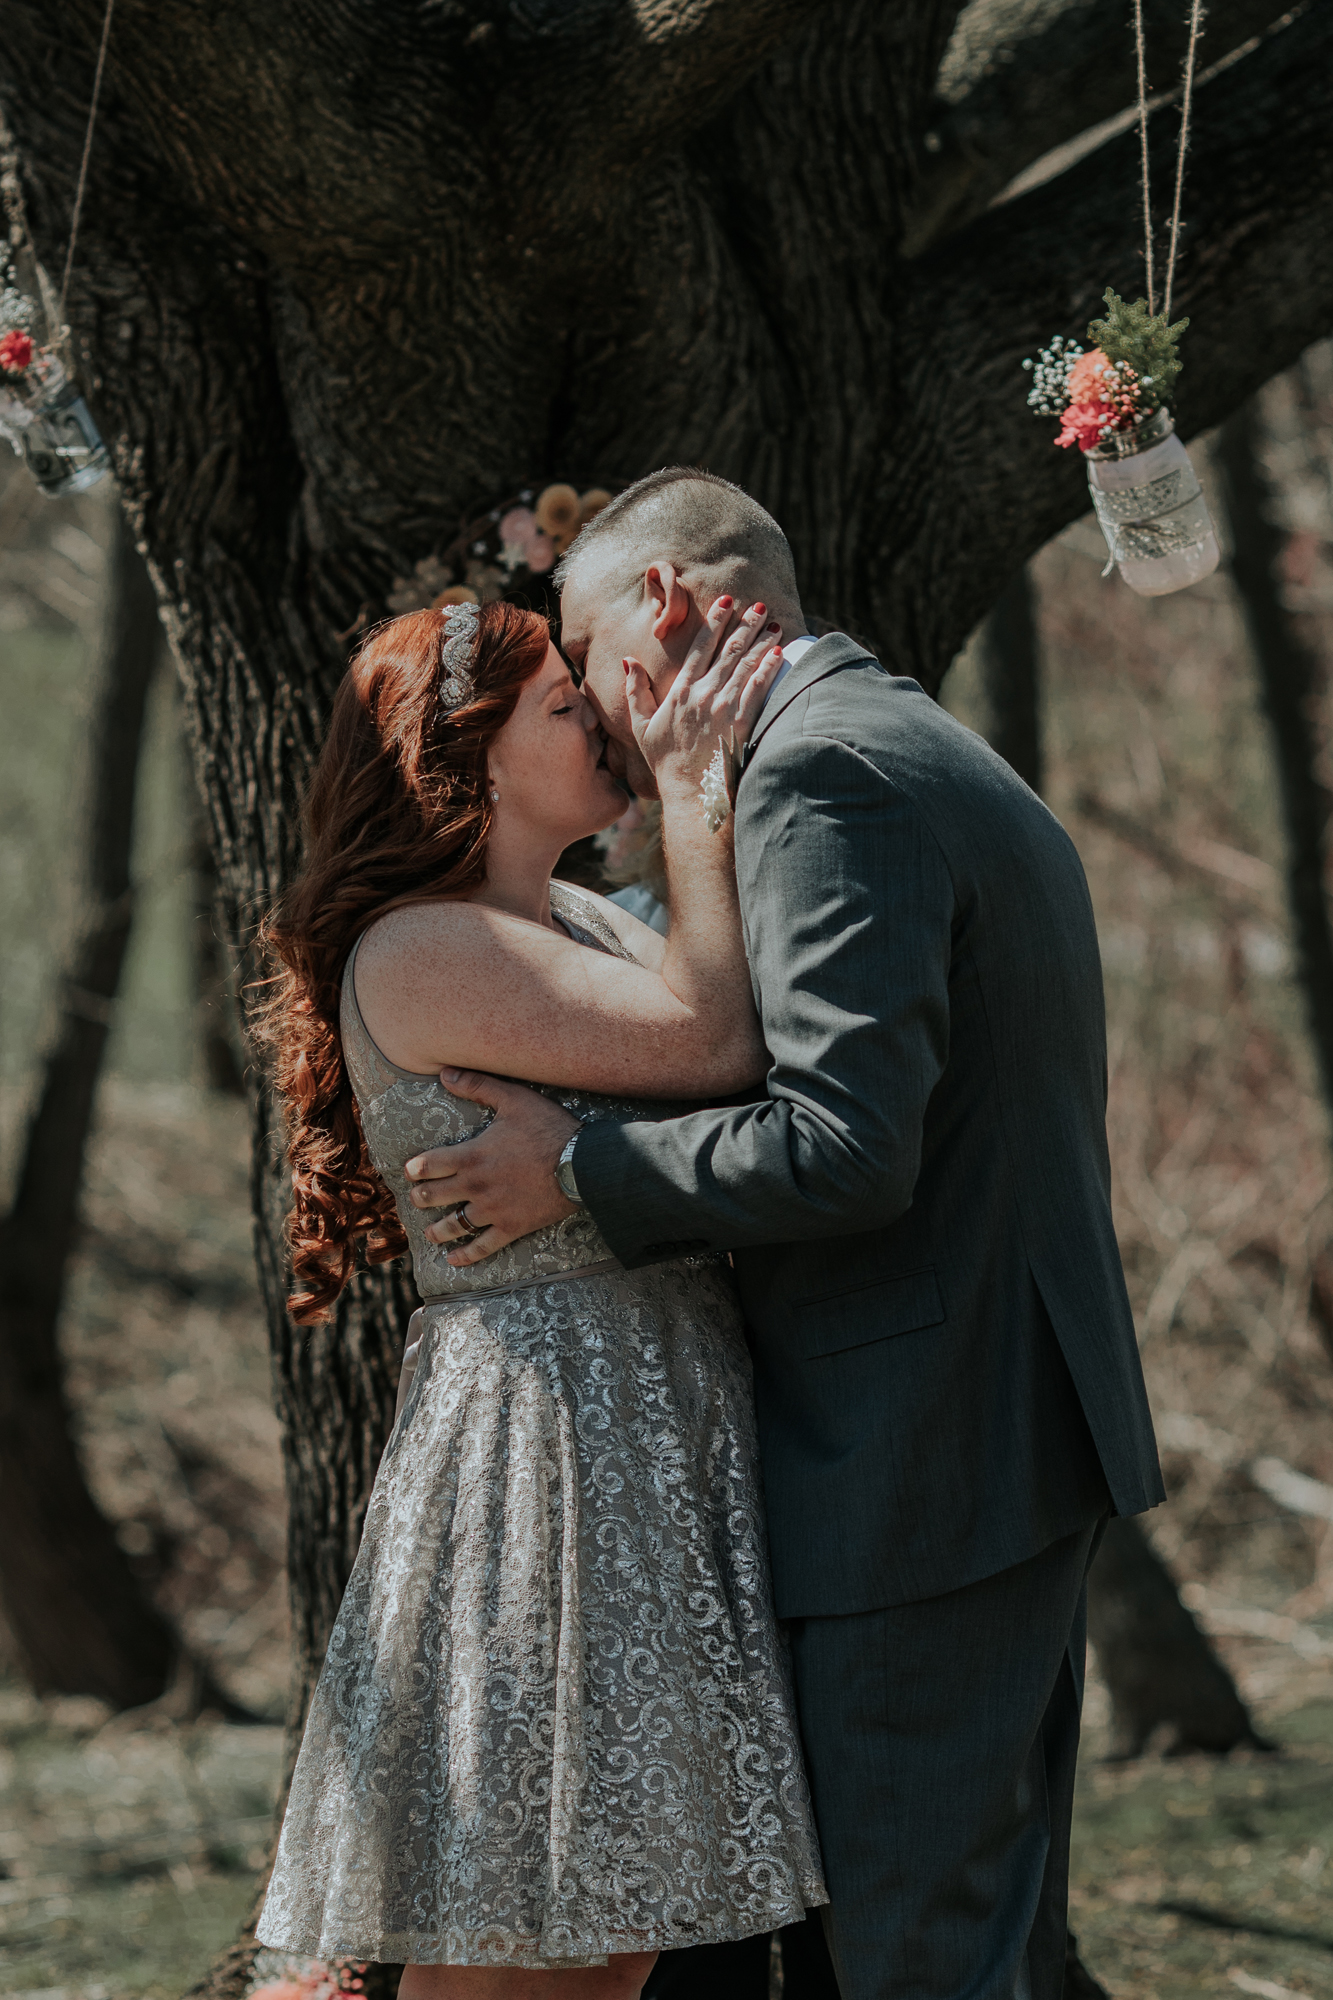 first-kiss-lehigh-valley-allentown-easton-bethlehem-pa-photography